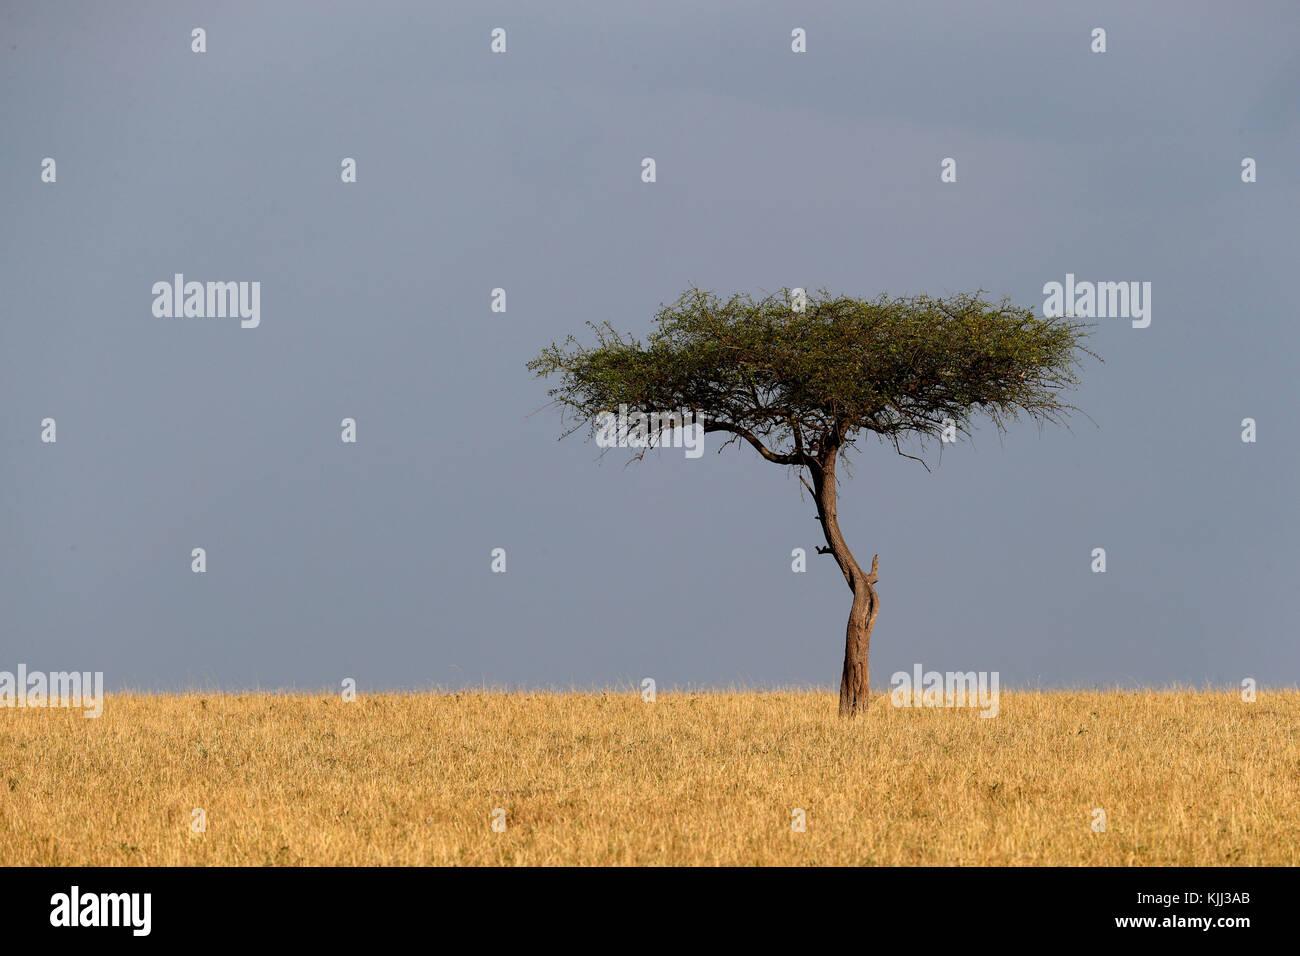 Acacia tree in the savanna.  Masai Mara game reserve. Kenya. Stock Photo